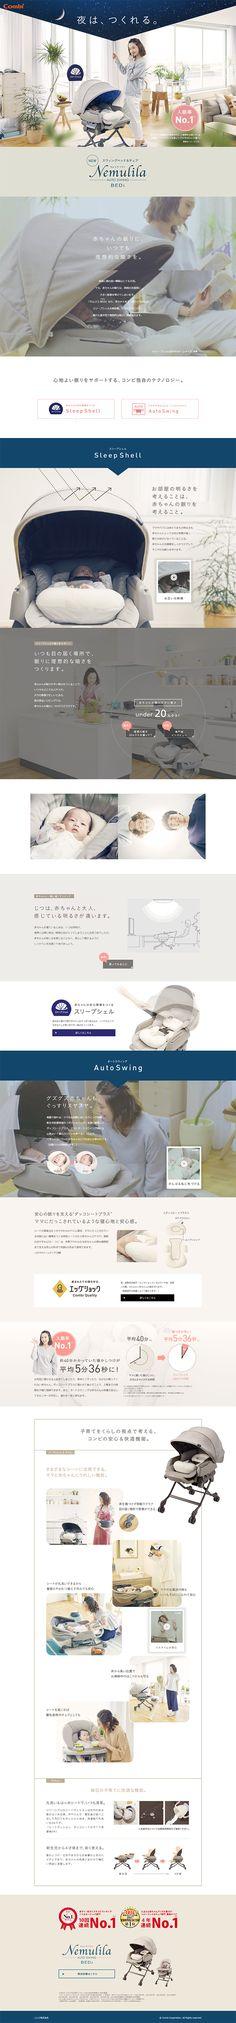 Nemulira DEDi|WEBデザイナーさん必見!ランディングページのデザイン参考に(信頼・安心系)